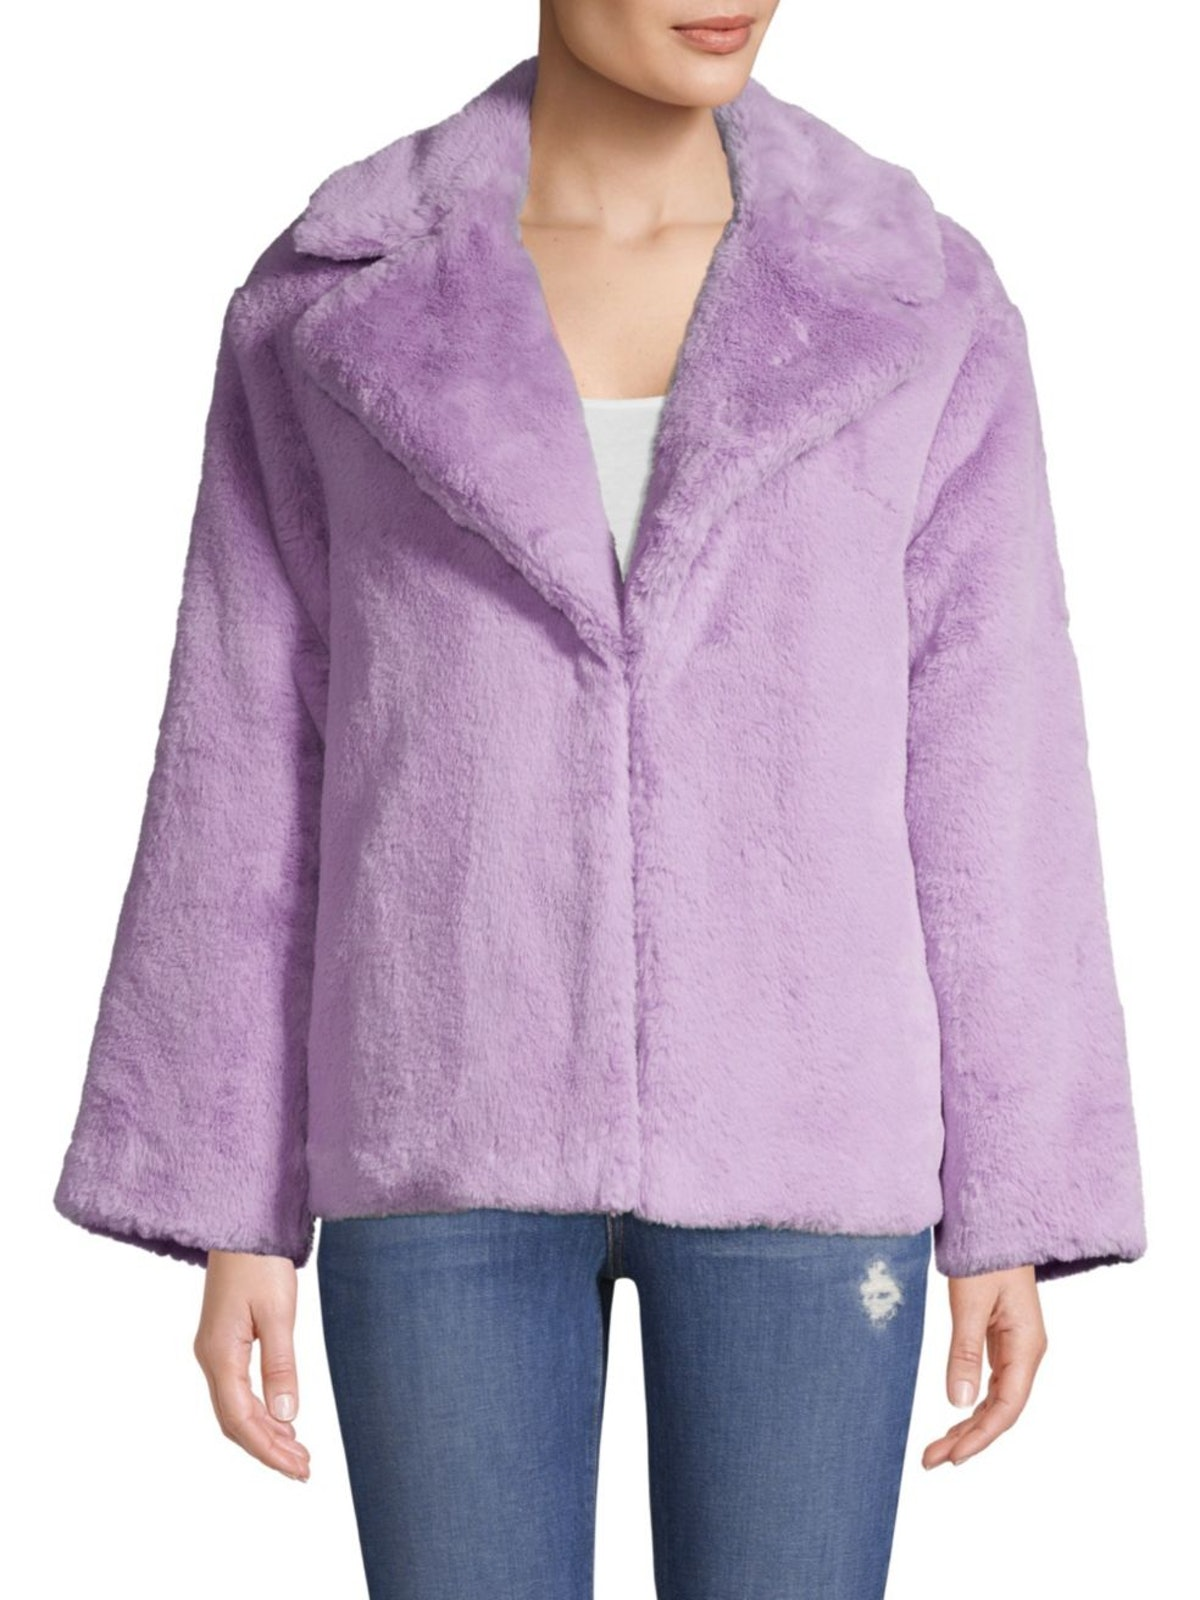 Alice + Olivia Thora Oversize Faux Fur Coat